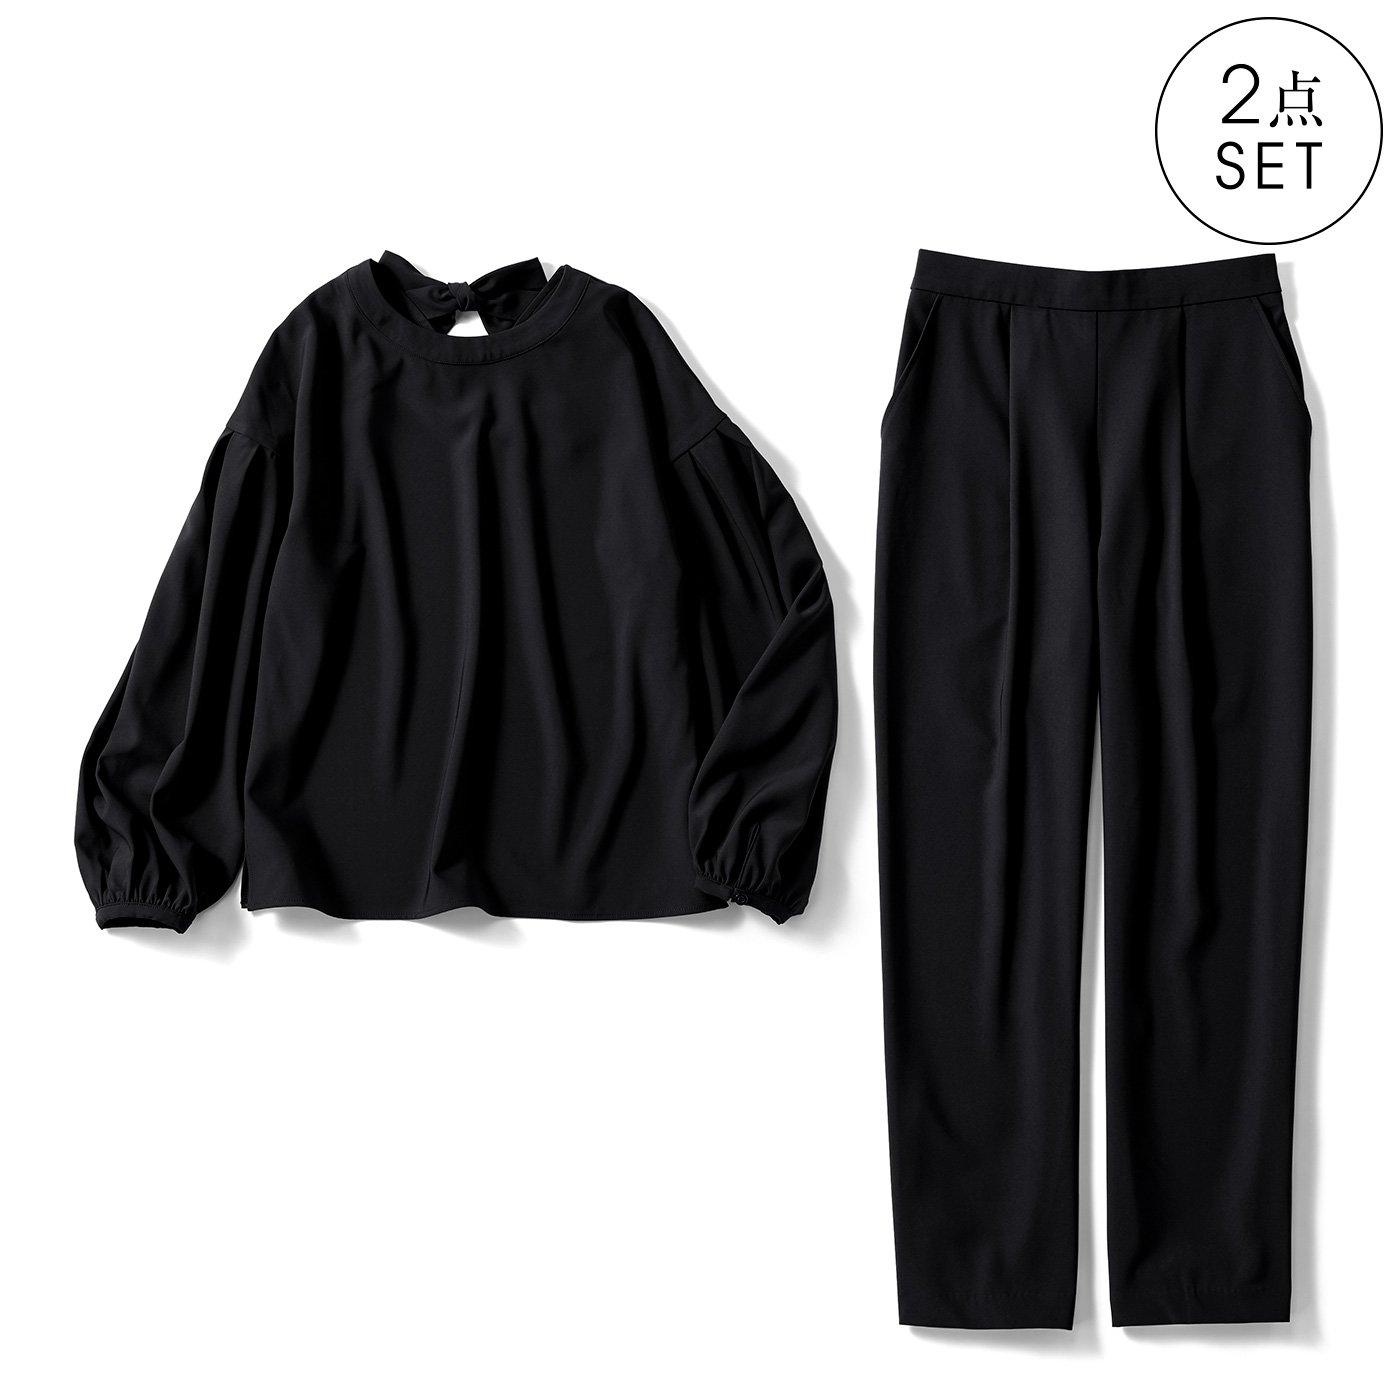 IEDIT[イディット] 小森美穂子さんコラボ ストレッチ素材のバックリボンセットアップ〈ブラック〉